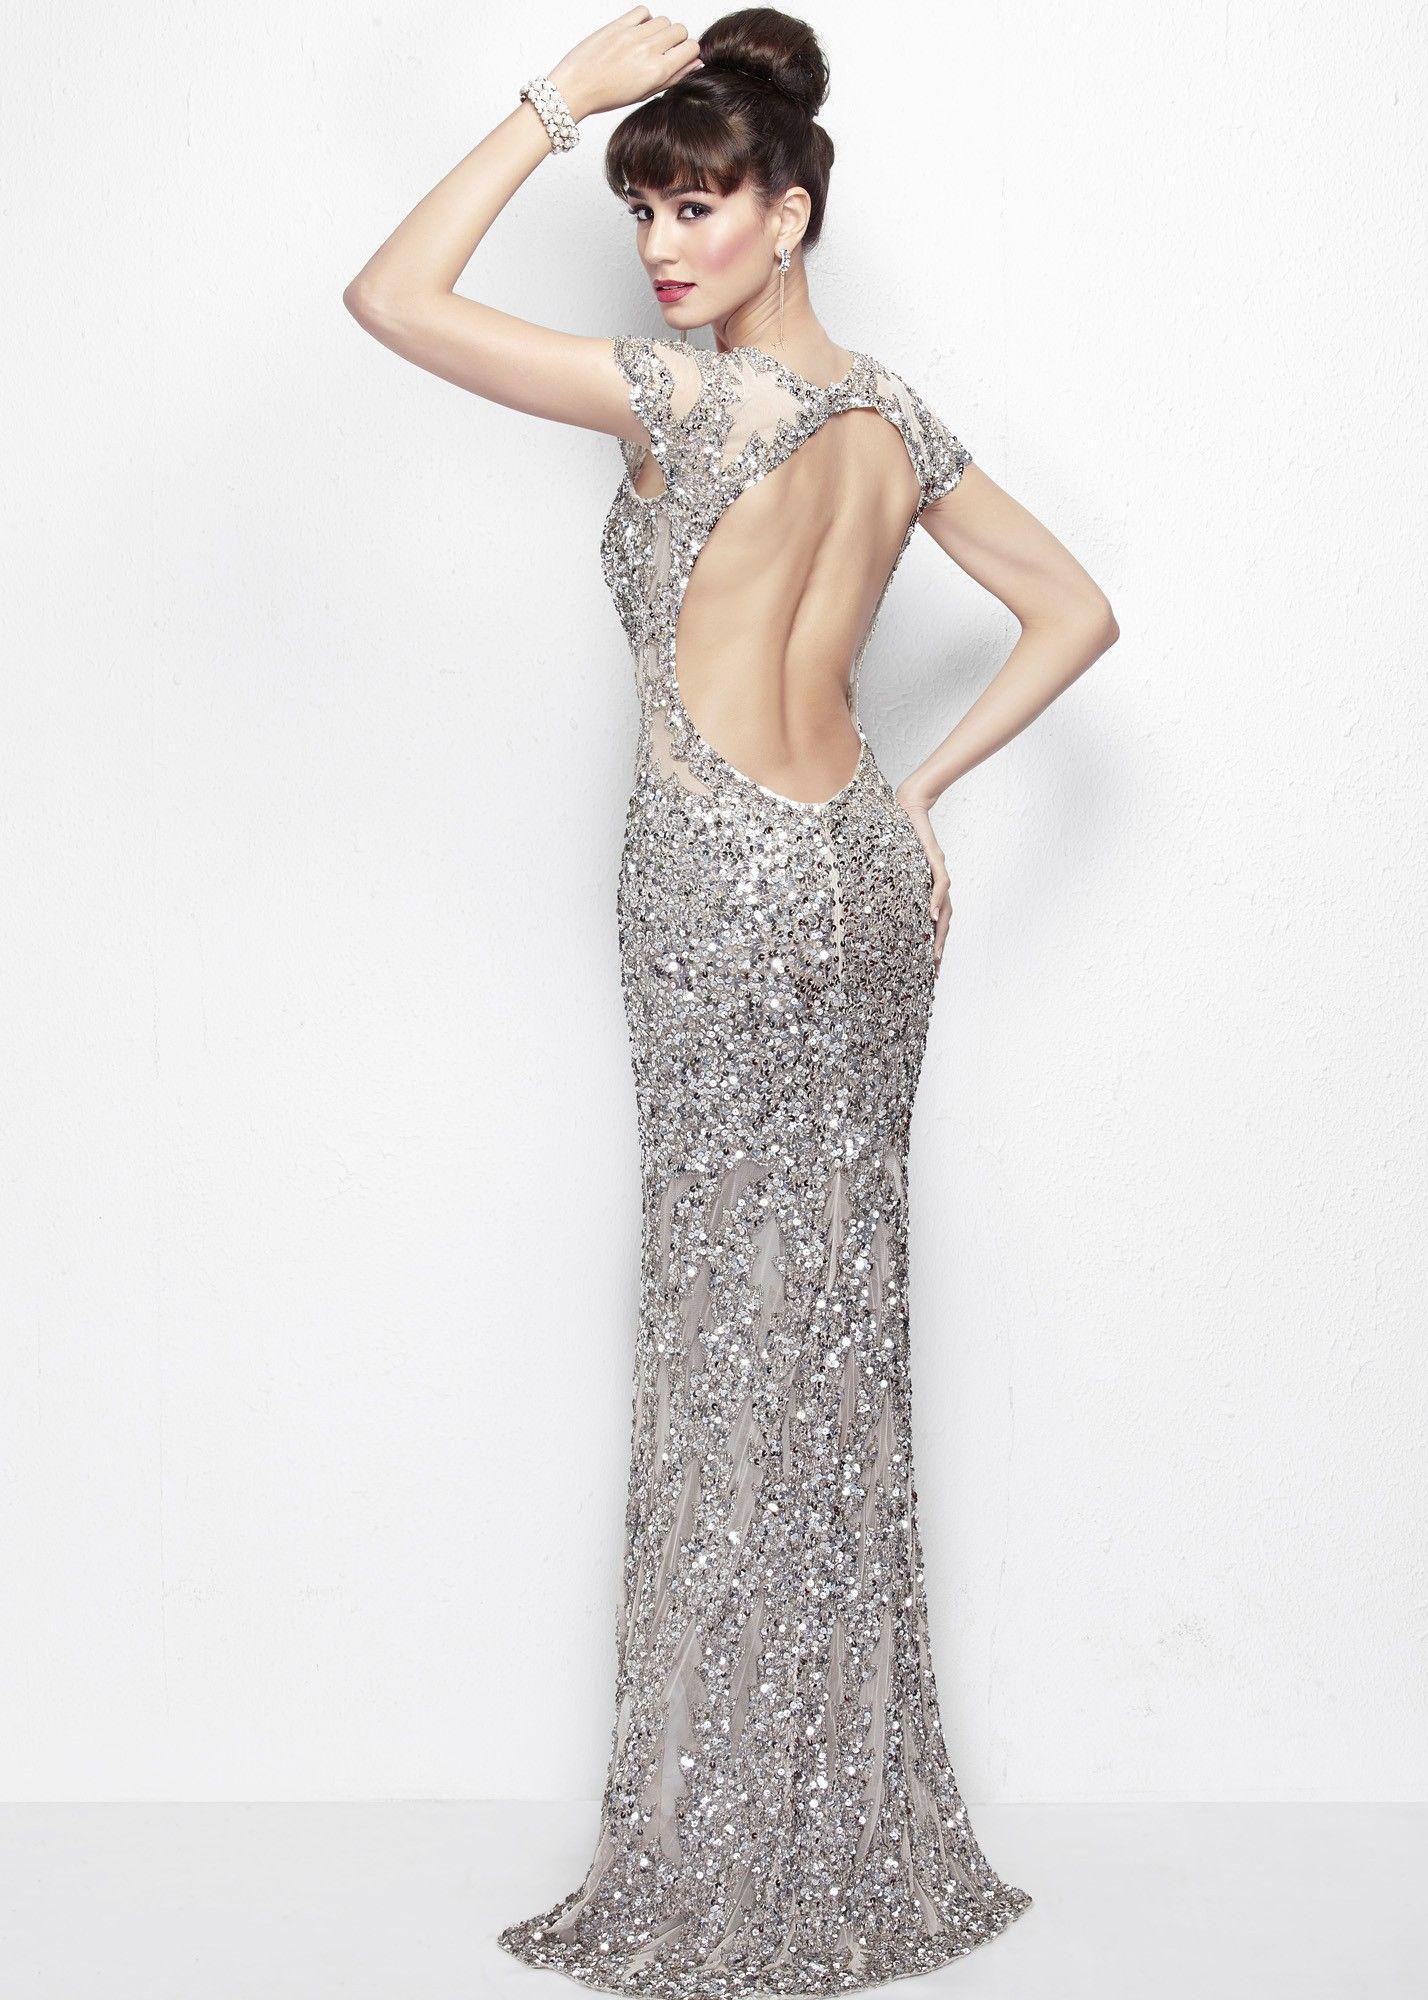 Primavera 9941 Floral Beaded Gown Prom Dresses Long Black Dresses Sequin Cocktail Dress [ 2000 x 1428 Pixel ]